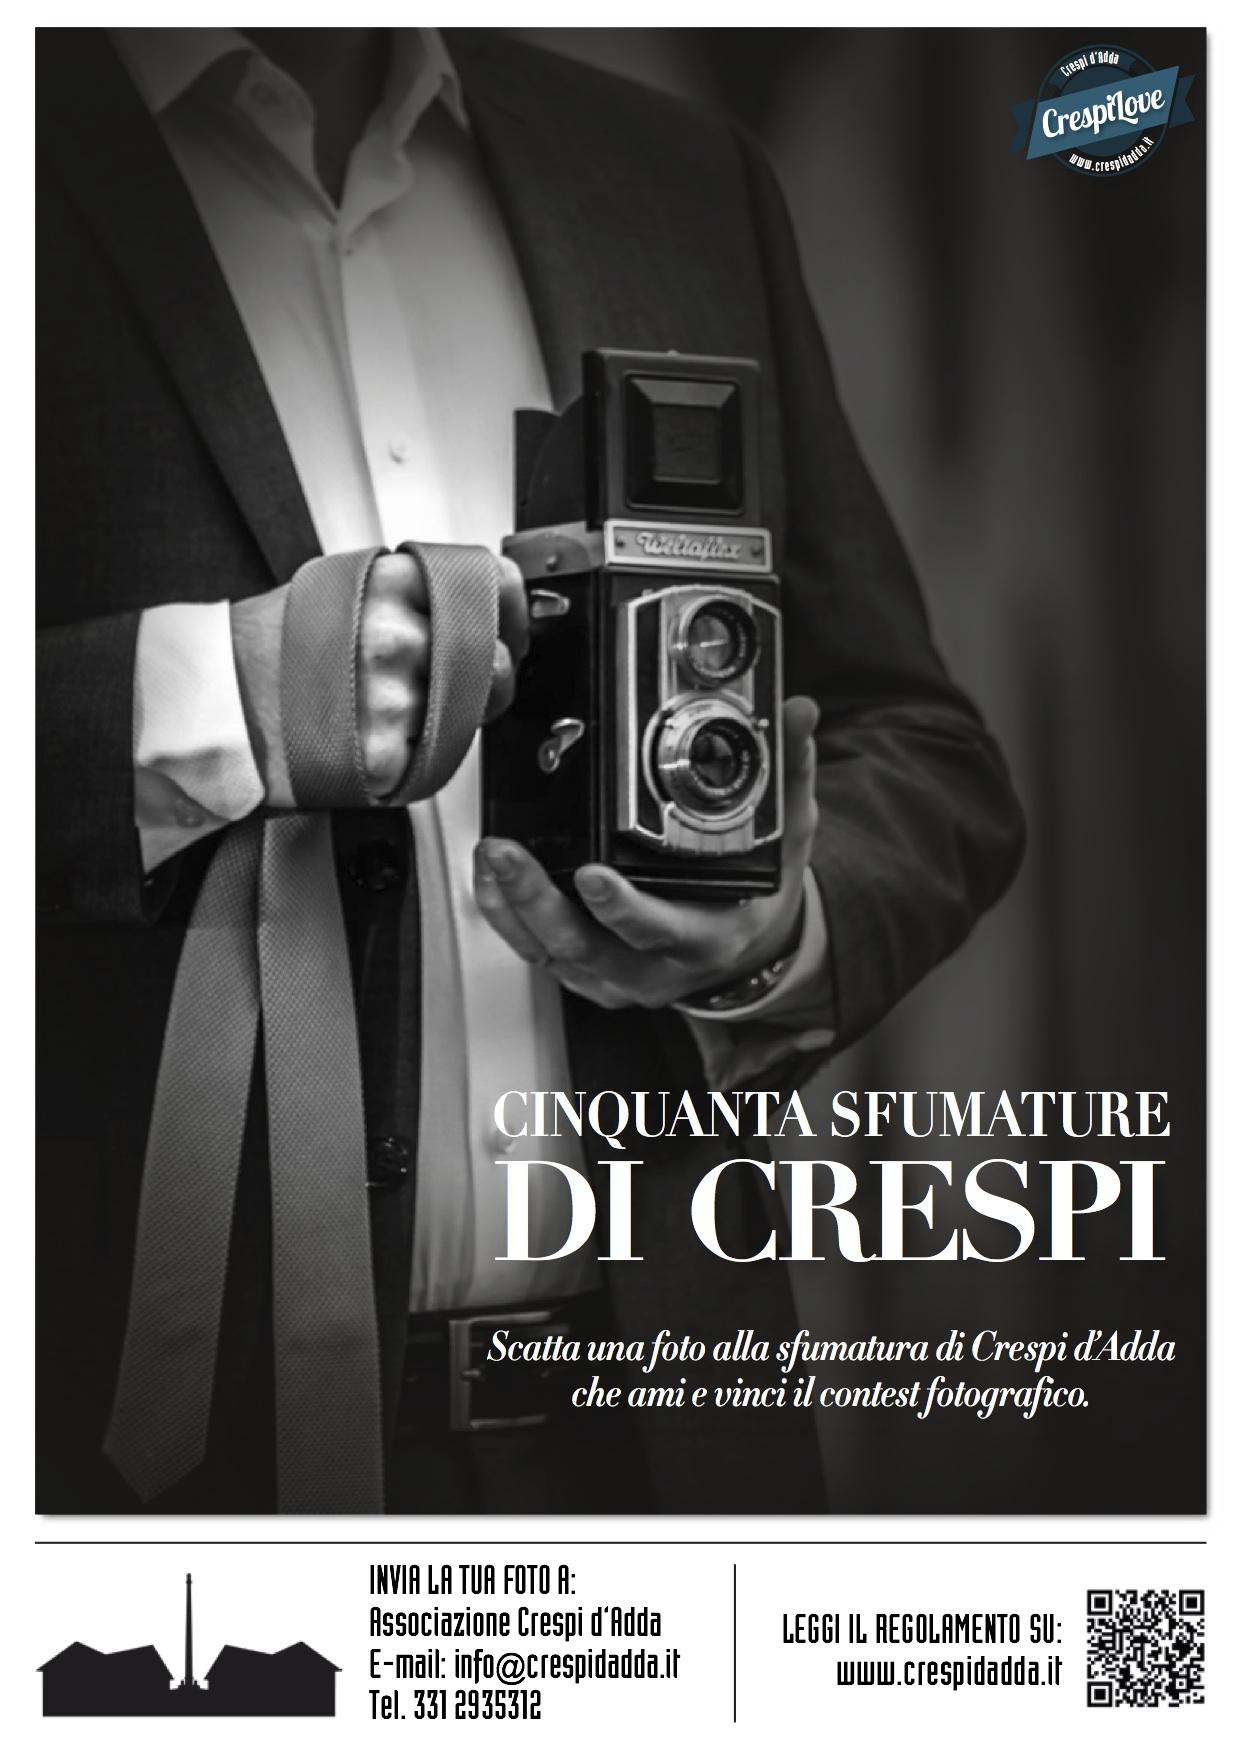 50_sfumature_di_crespi_photocontest_crespidadda